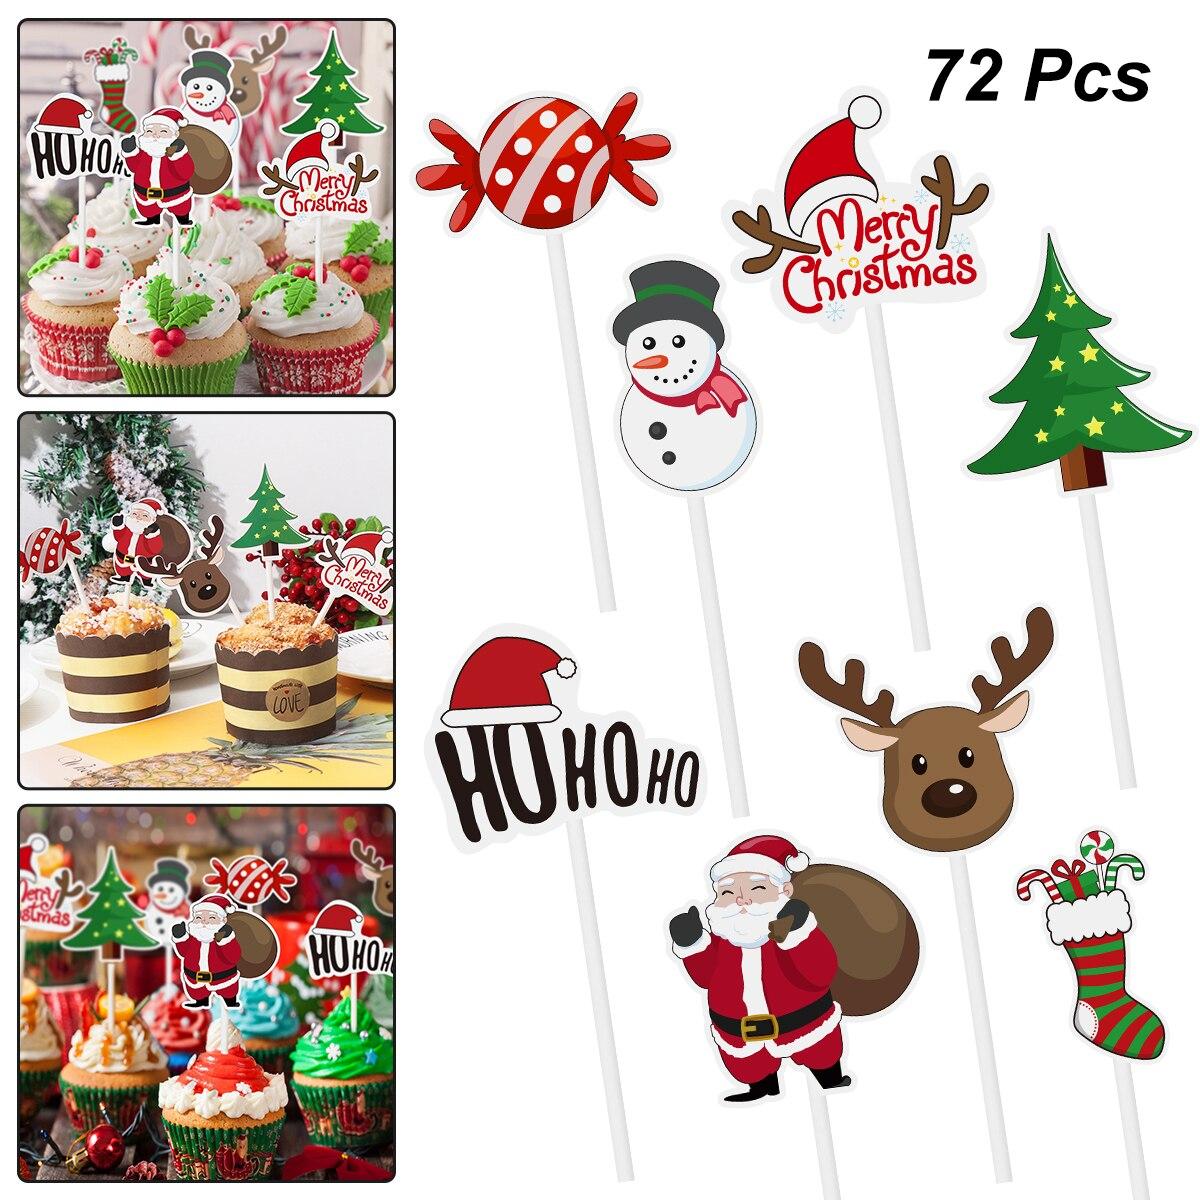 Christmas Party Decor Baking Muffin Holder Gift Santa Belt Food Cupcake Boxes